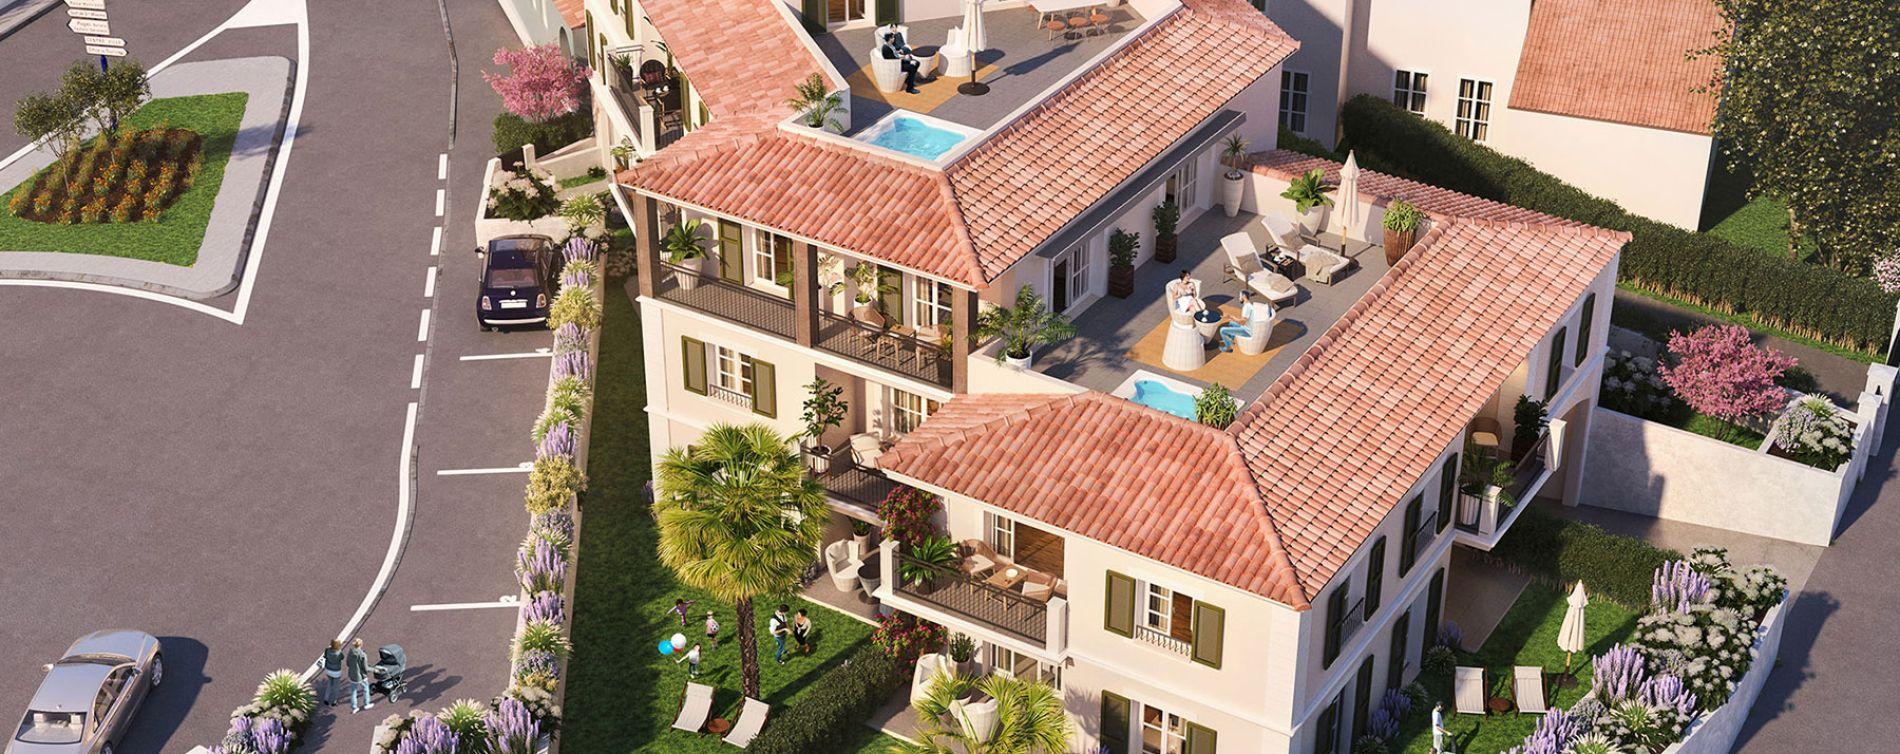 Résidence Villa Massimo à Sainte-Maxime